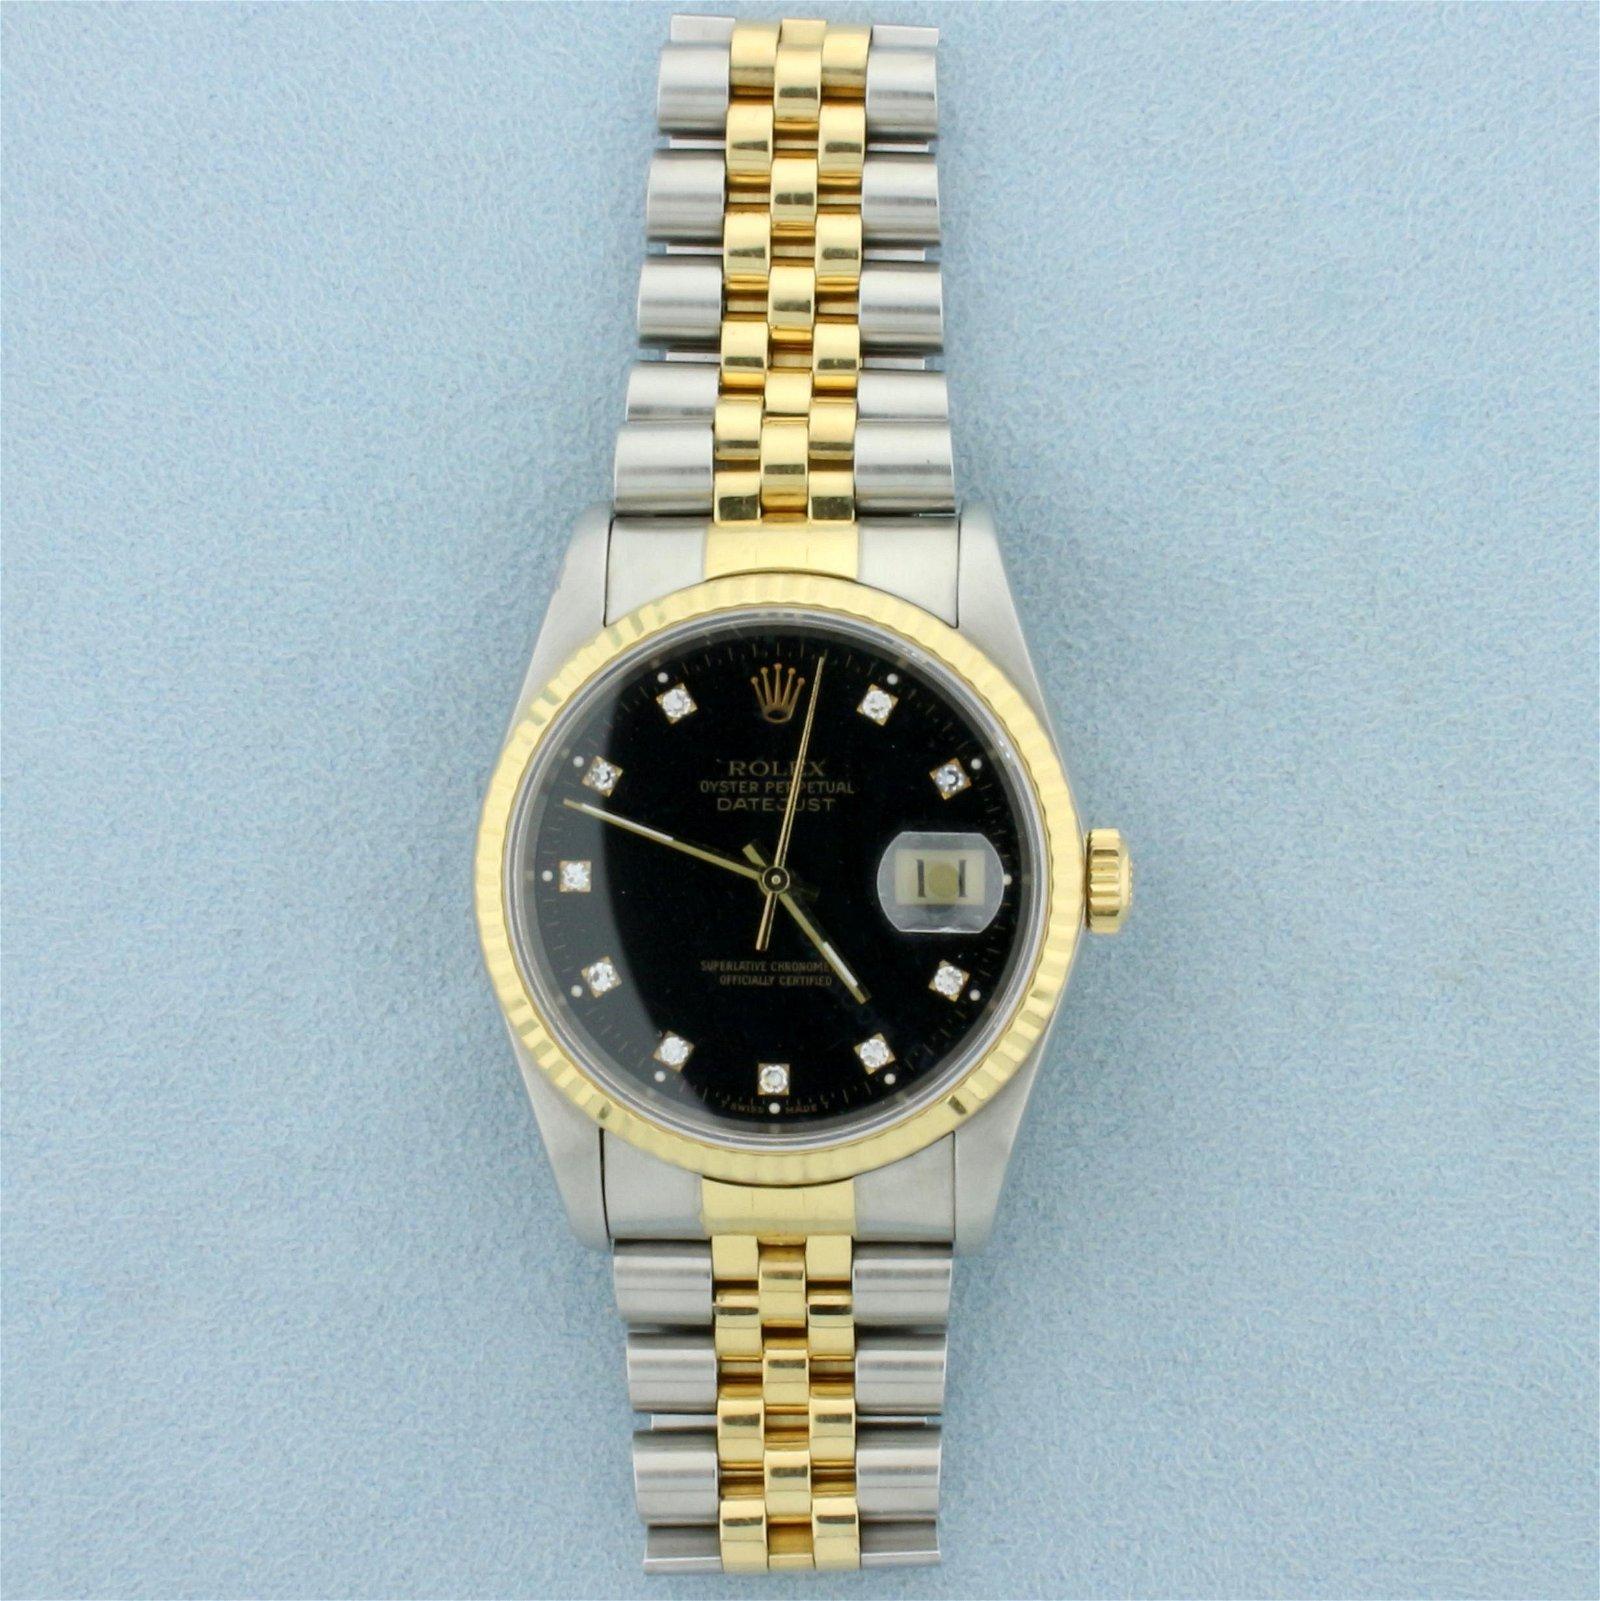 Men's Rolex DateJust 36mm Watch With Black Diamond Dial